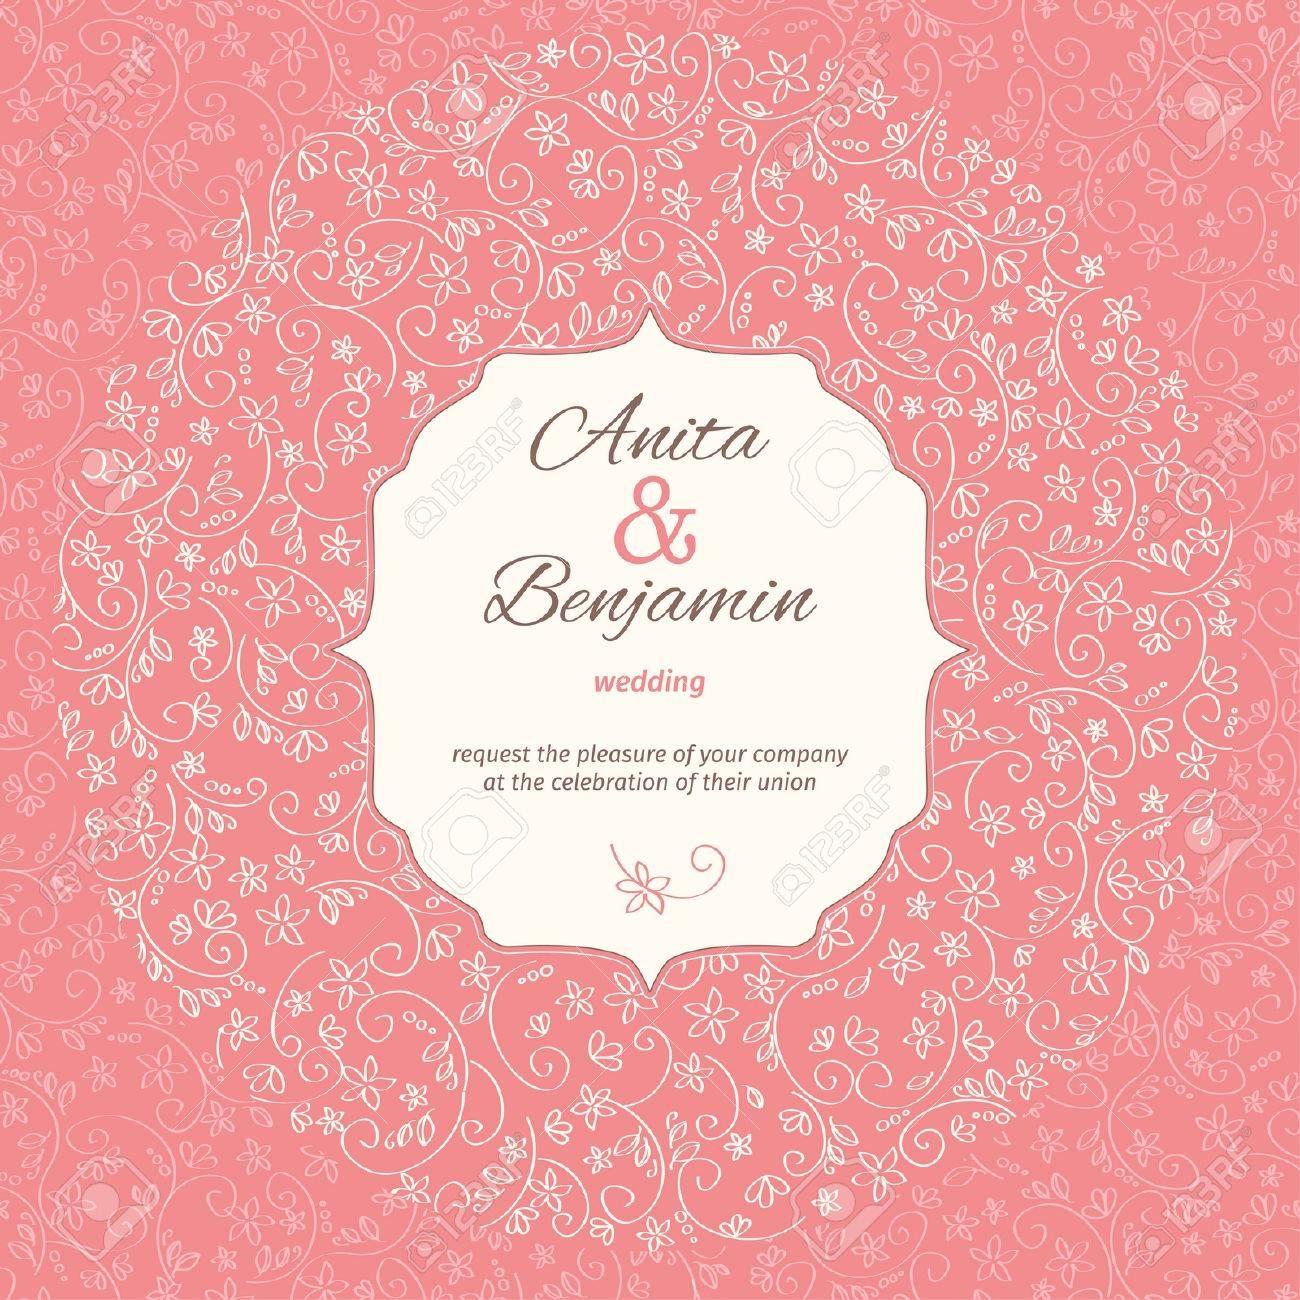 wedding invitation template - 29661190